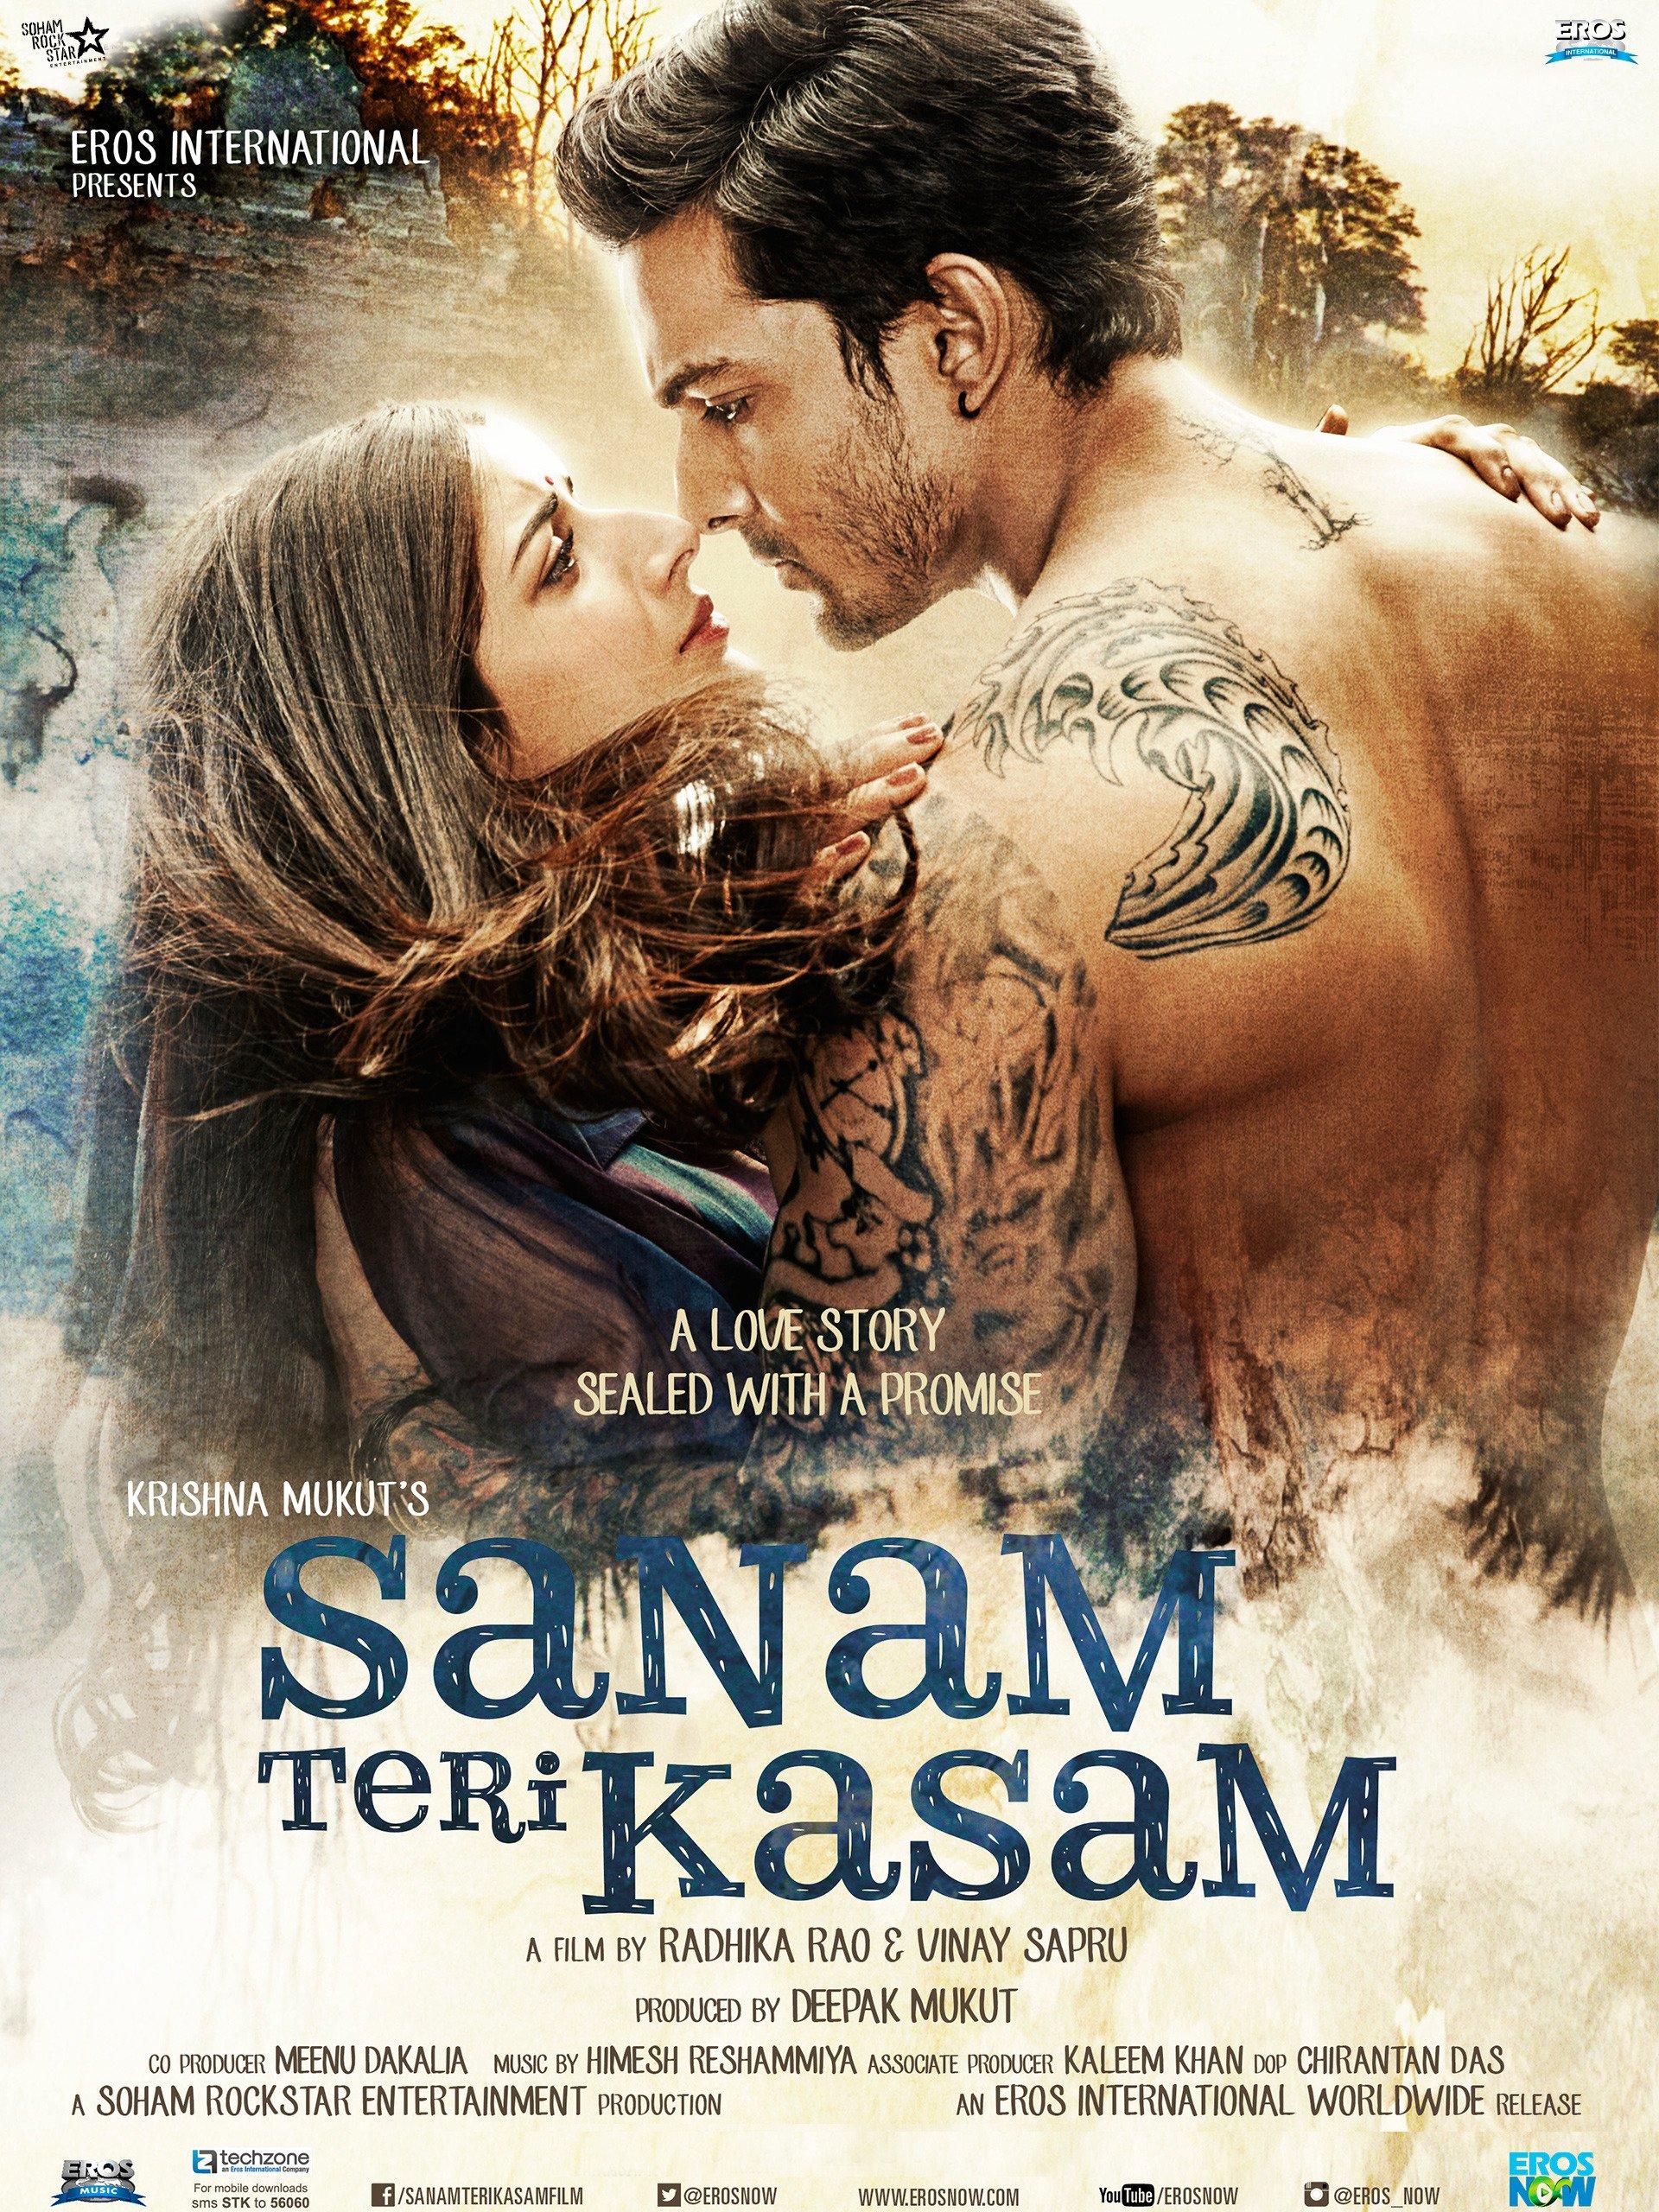 Sanam Teri Kasam (2016) 720p + 1080p BluRay x264 AC3 Hindi DD5.1 CH